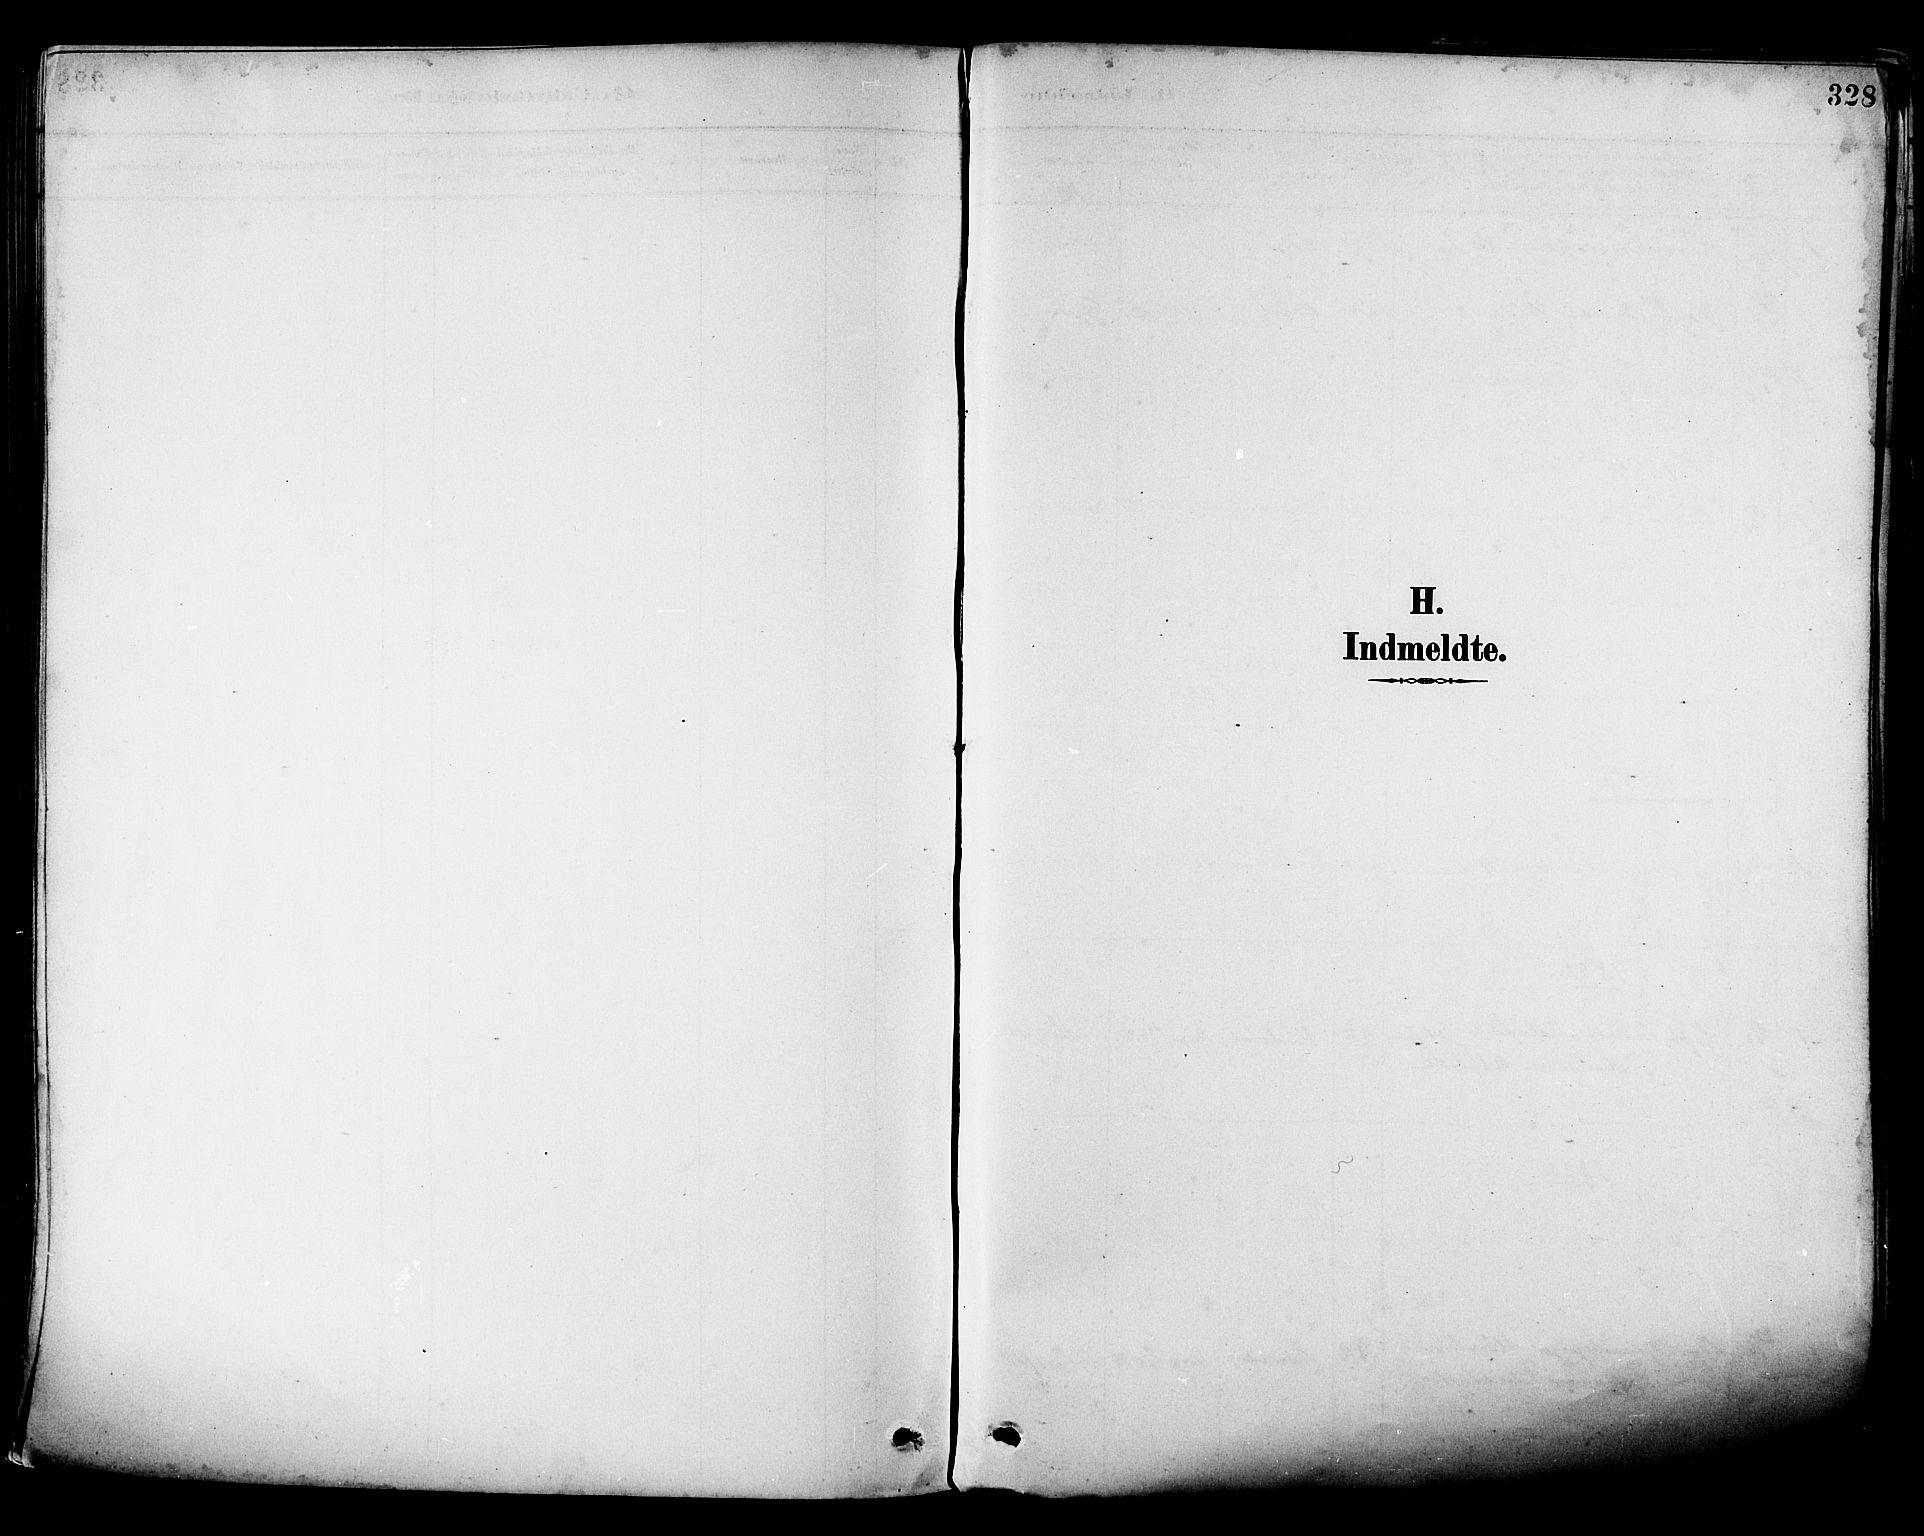 SAT, Ministerialprotokoller, klokkerbøker og fødselsregistre - Nordland, 880/L1133: Ministerialbok nr. 880A07, 1888-1898, s. 328